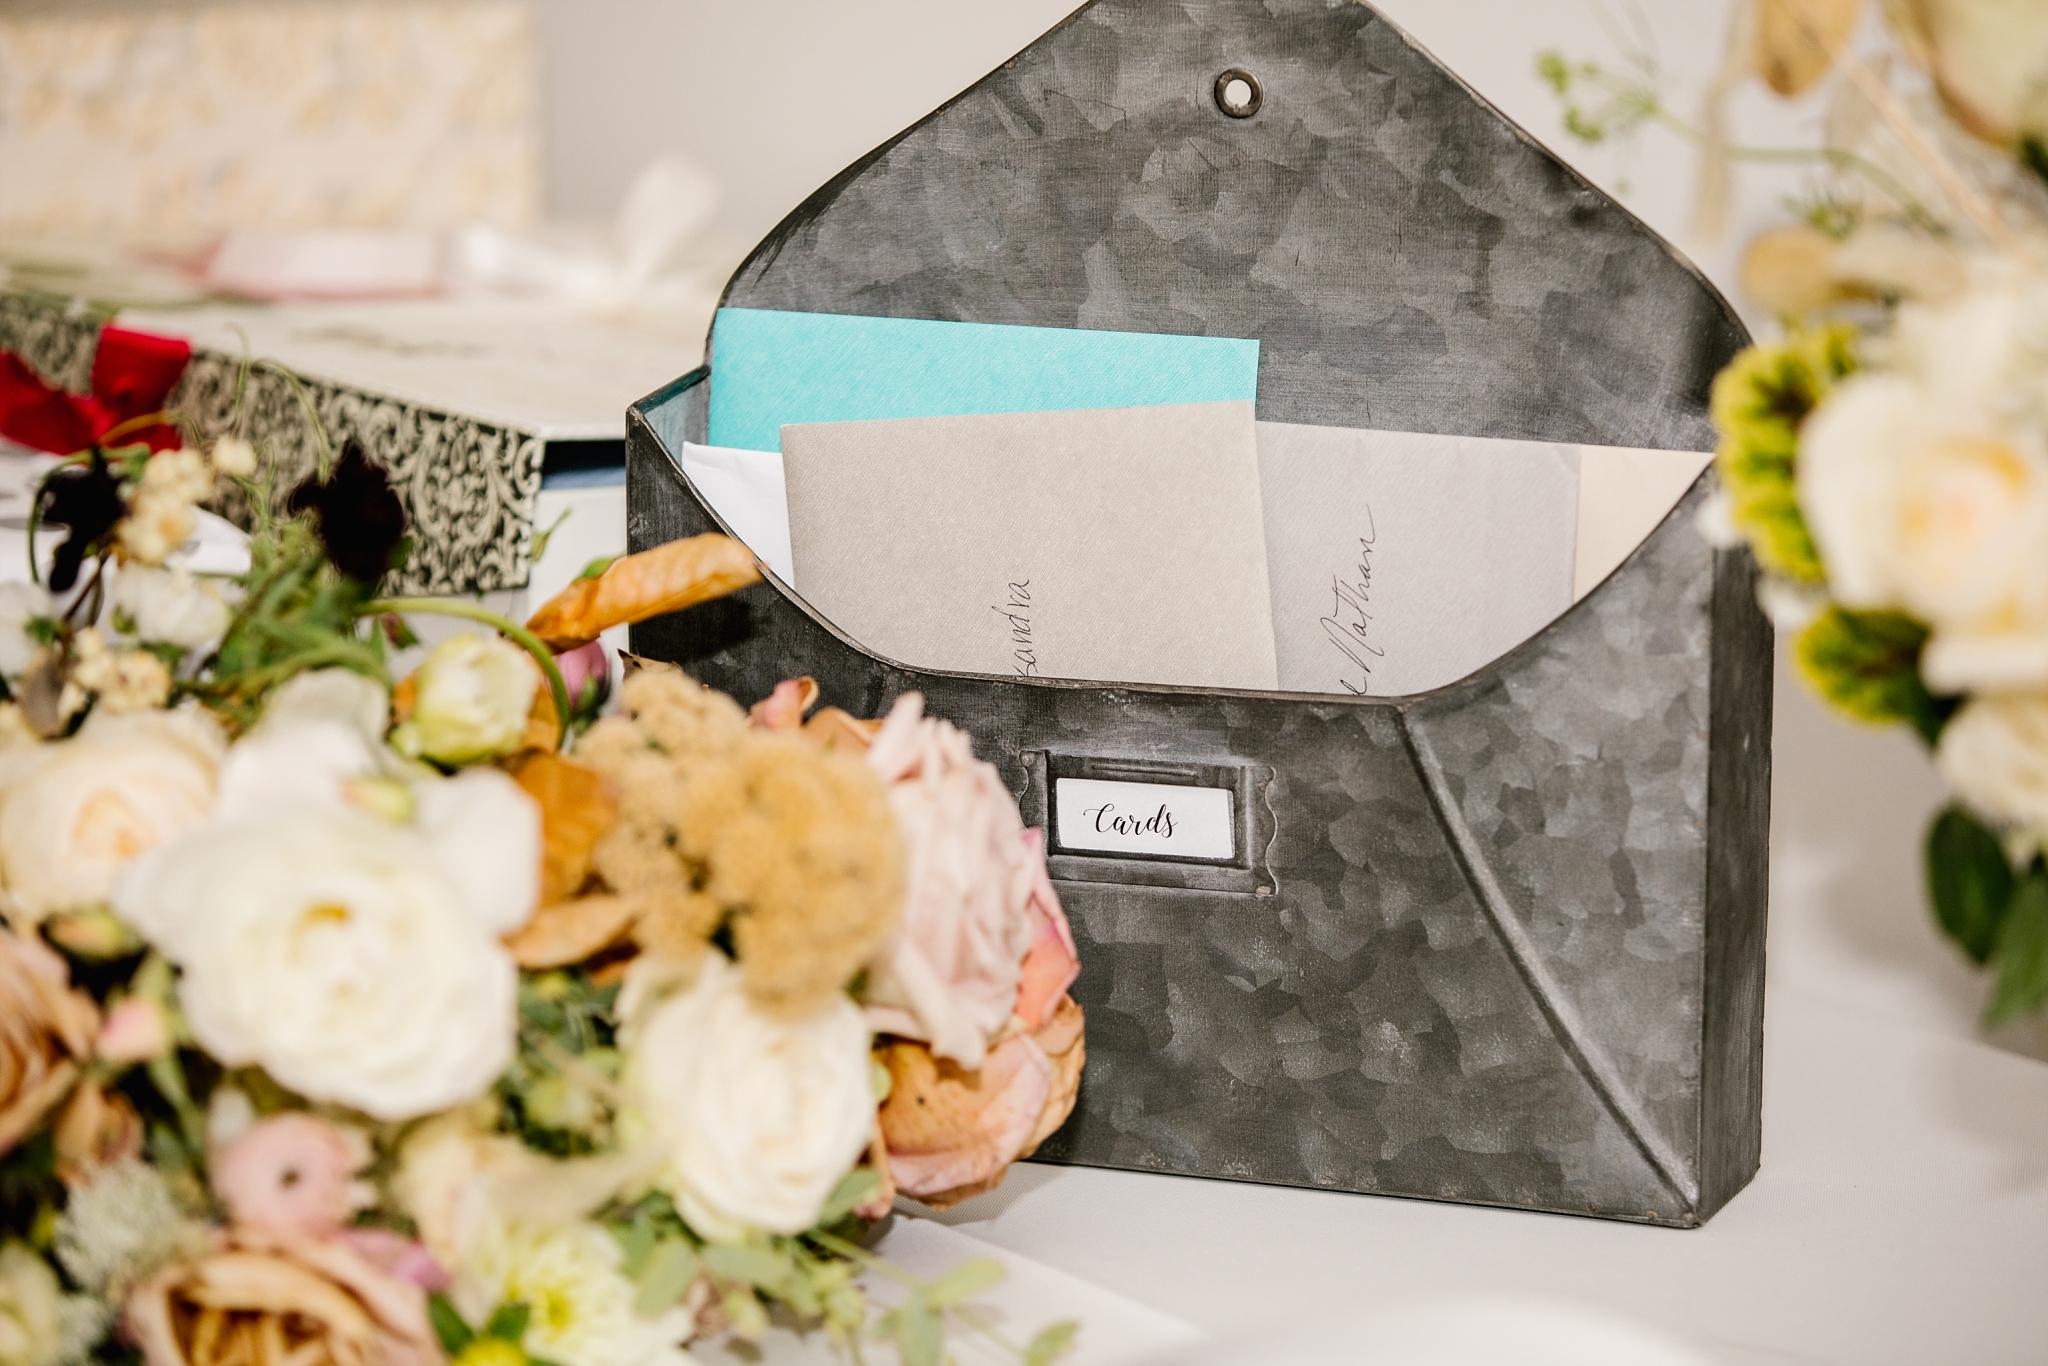 CN-Wedding-351_Lizzie-B-Imagery-Utah-Wedding-Photographer-Blessed-Sacrament-Catholic-Church-Sandy-Utah-The-Blended-Table-Salt-Lake-City.jpg